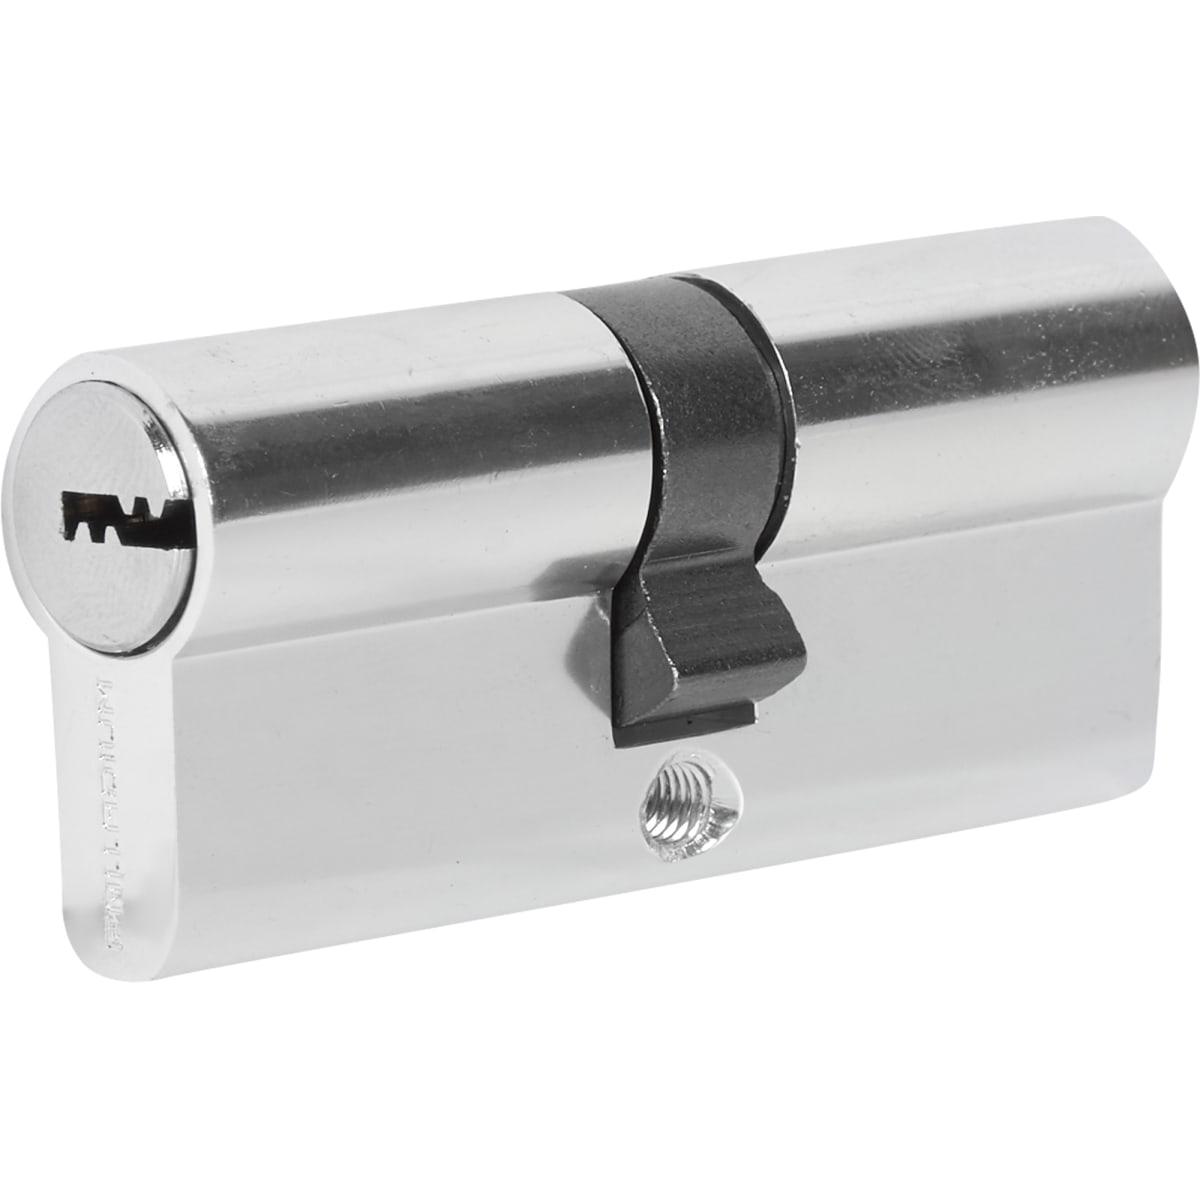 Цилиндр перфорированный Al 70 C CP ключ-ключ, хром